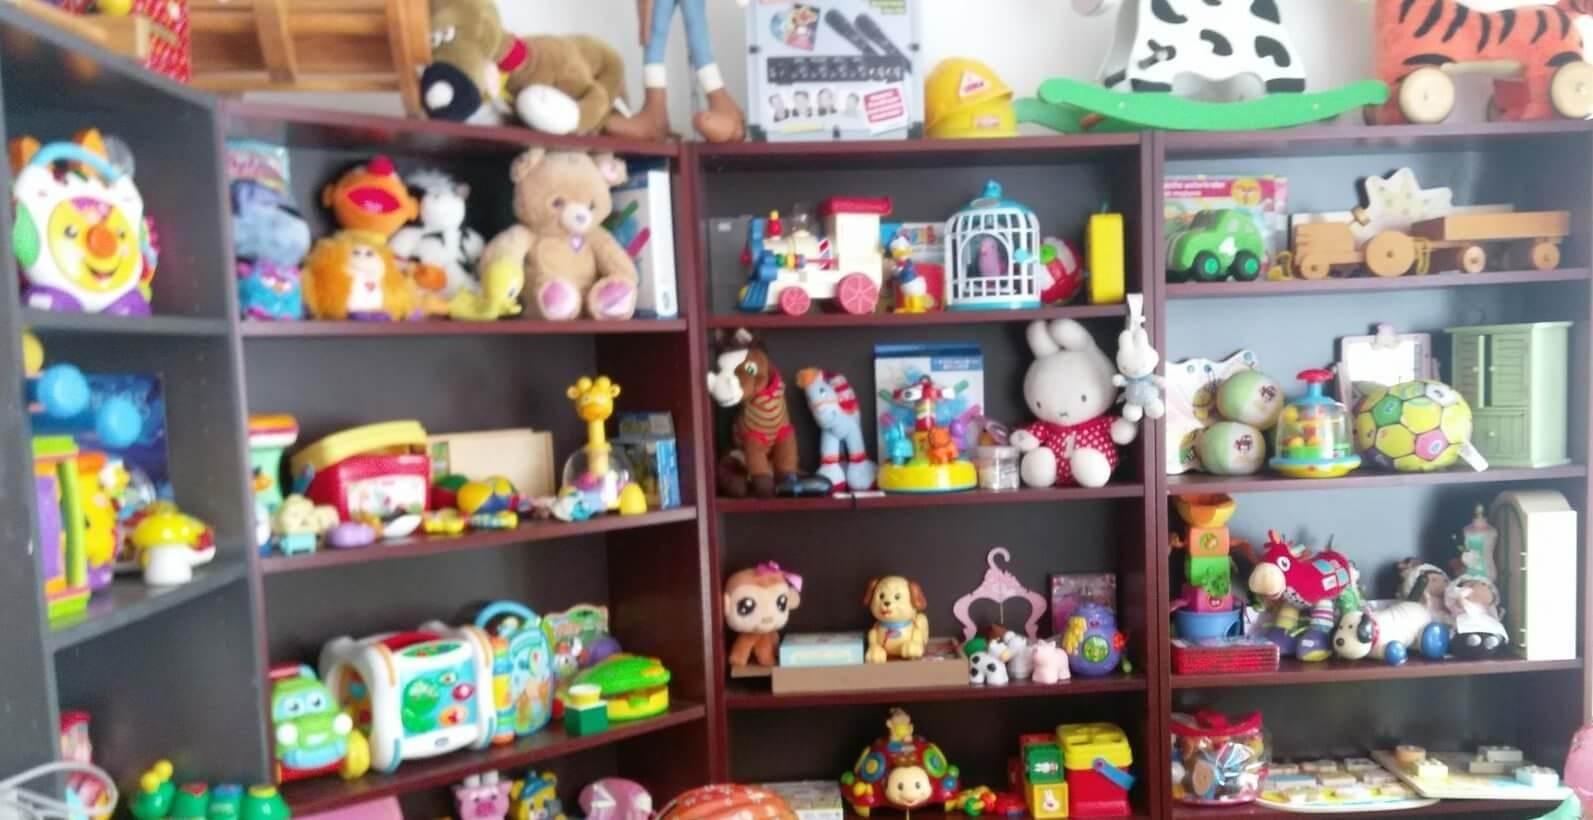 Haags Kinderparadijs